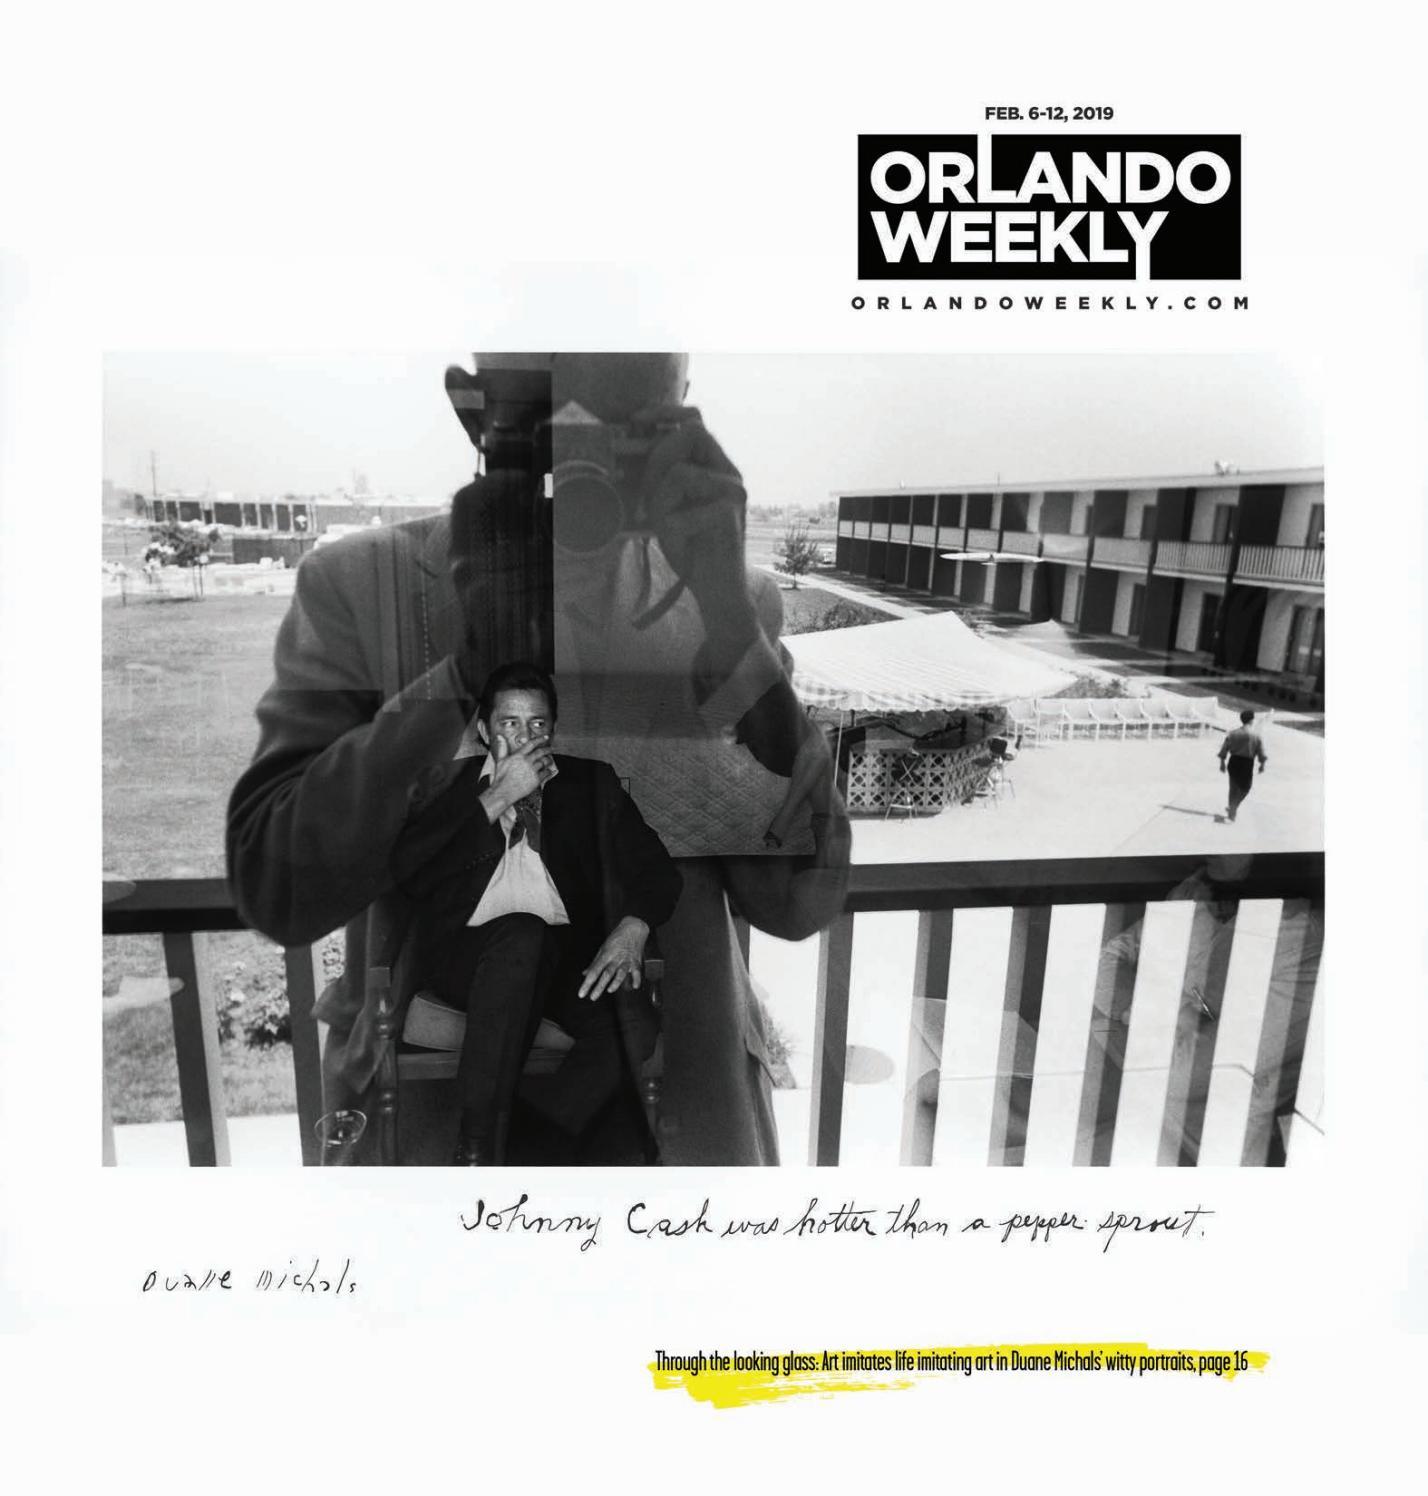 953c1c500f751 Orlando Weekly February 6